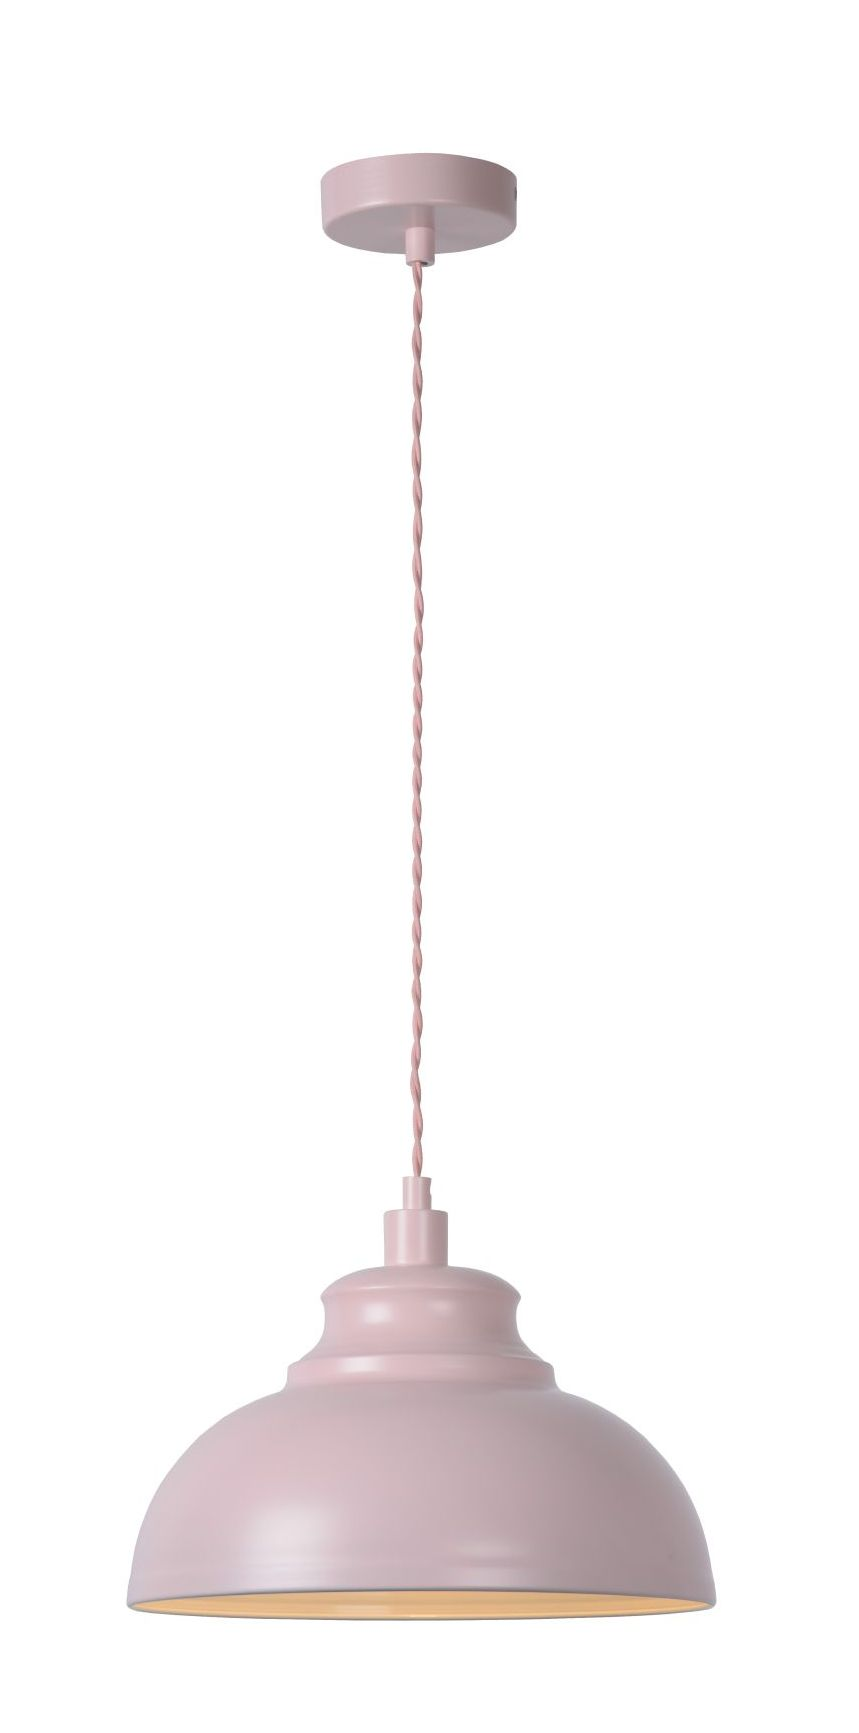 Lampa wisząca ISLA - 34400/29/66